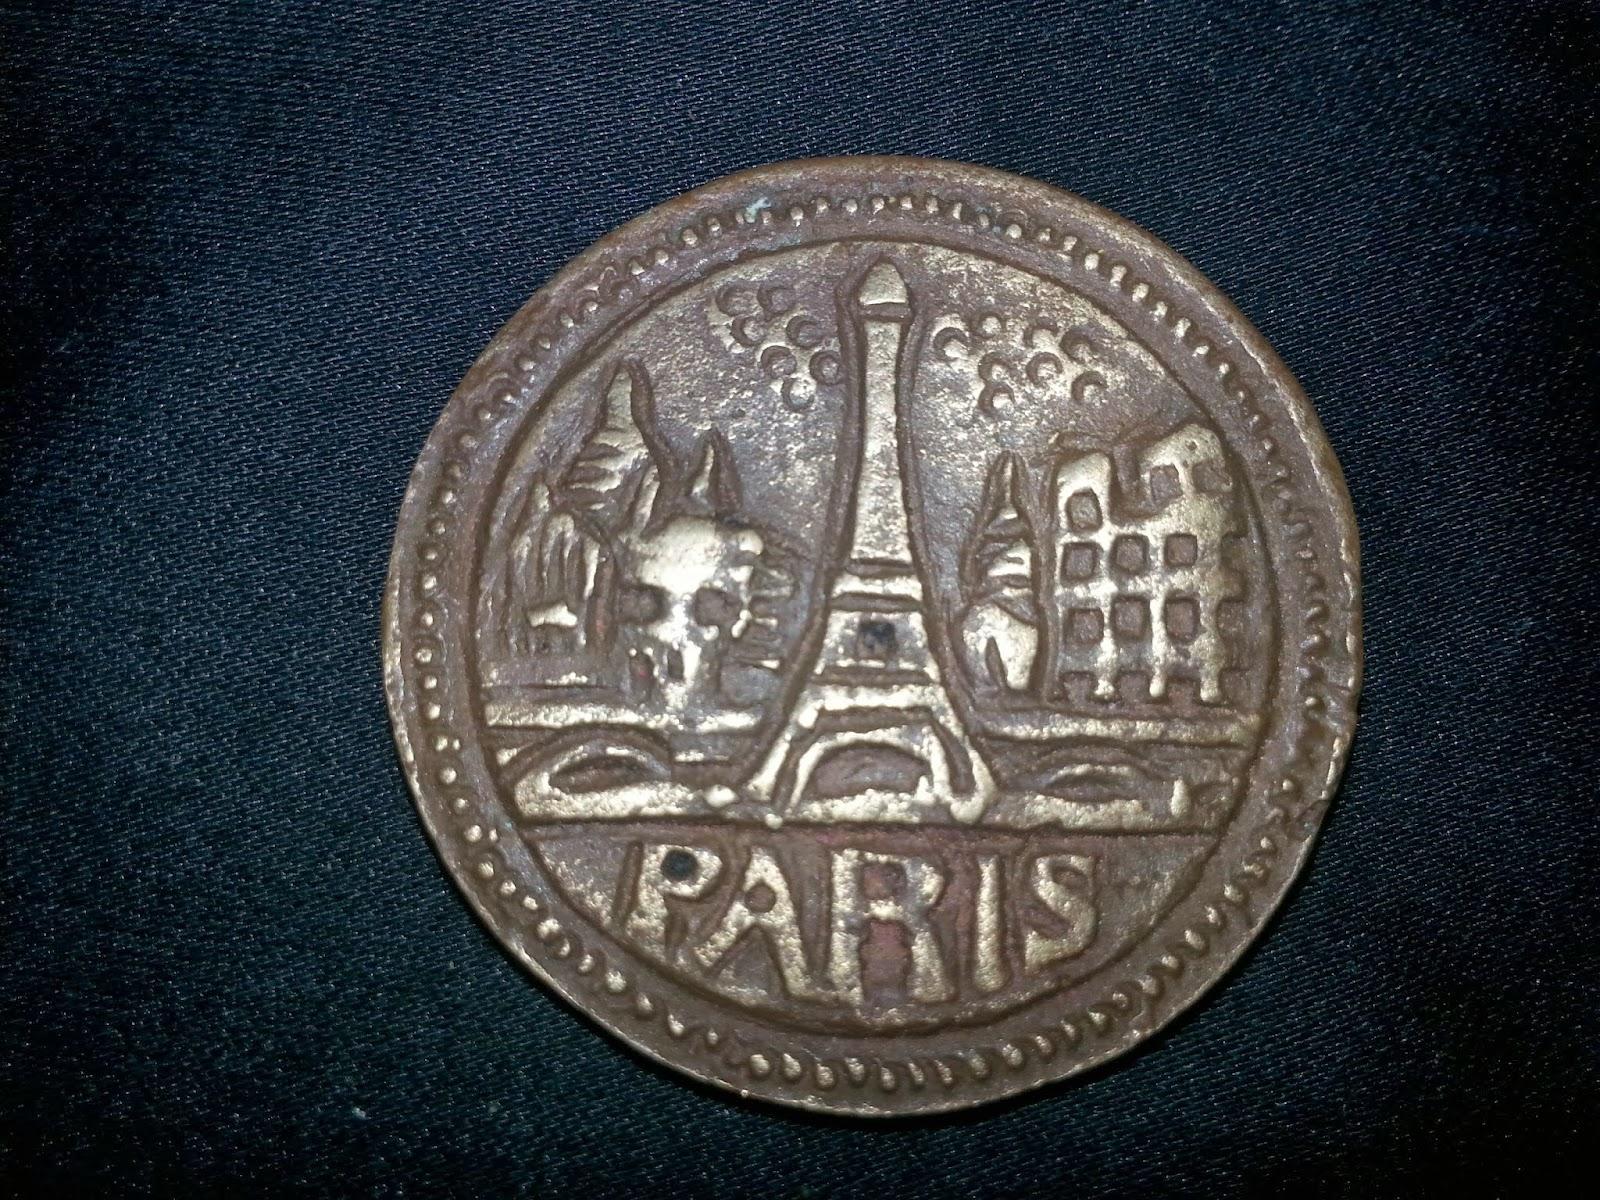 World War II Coins and Currency  joelscoinscom